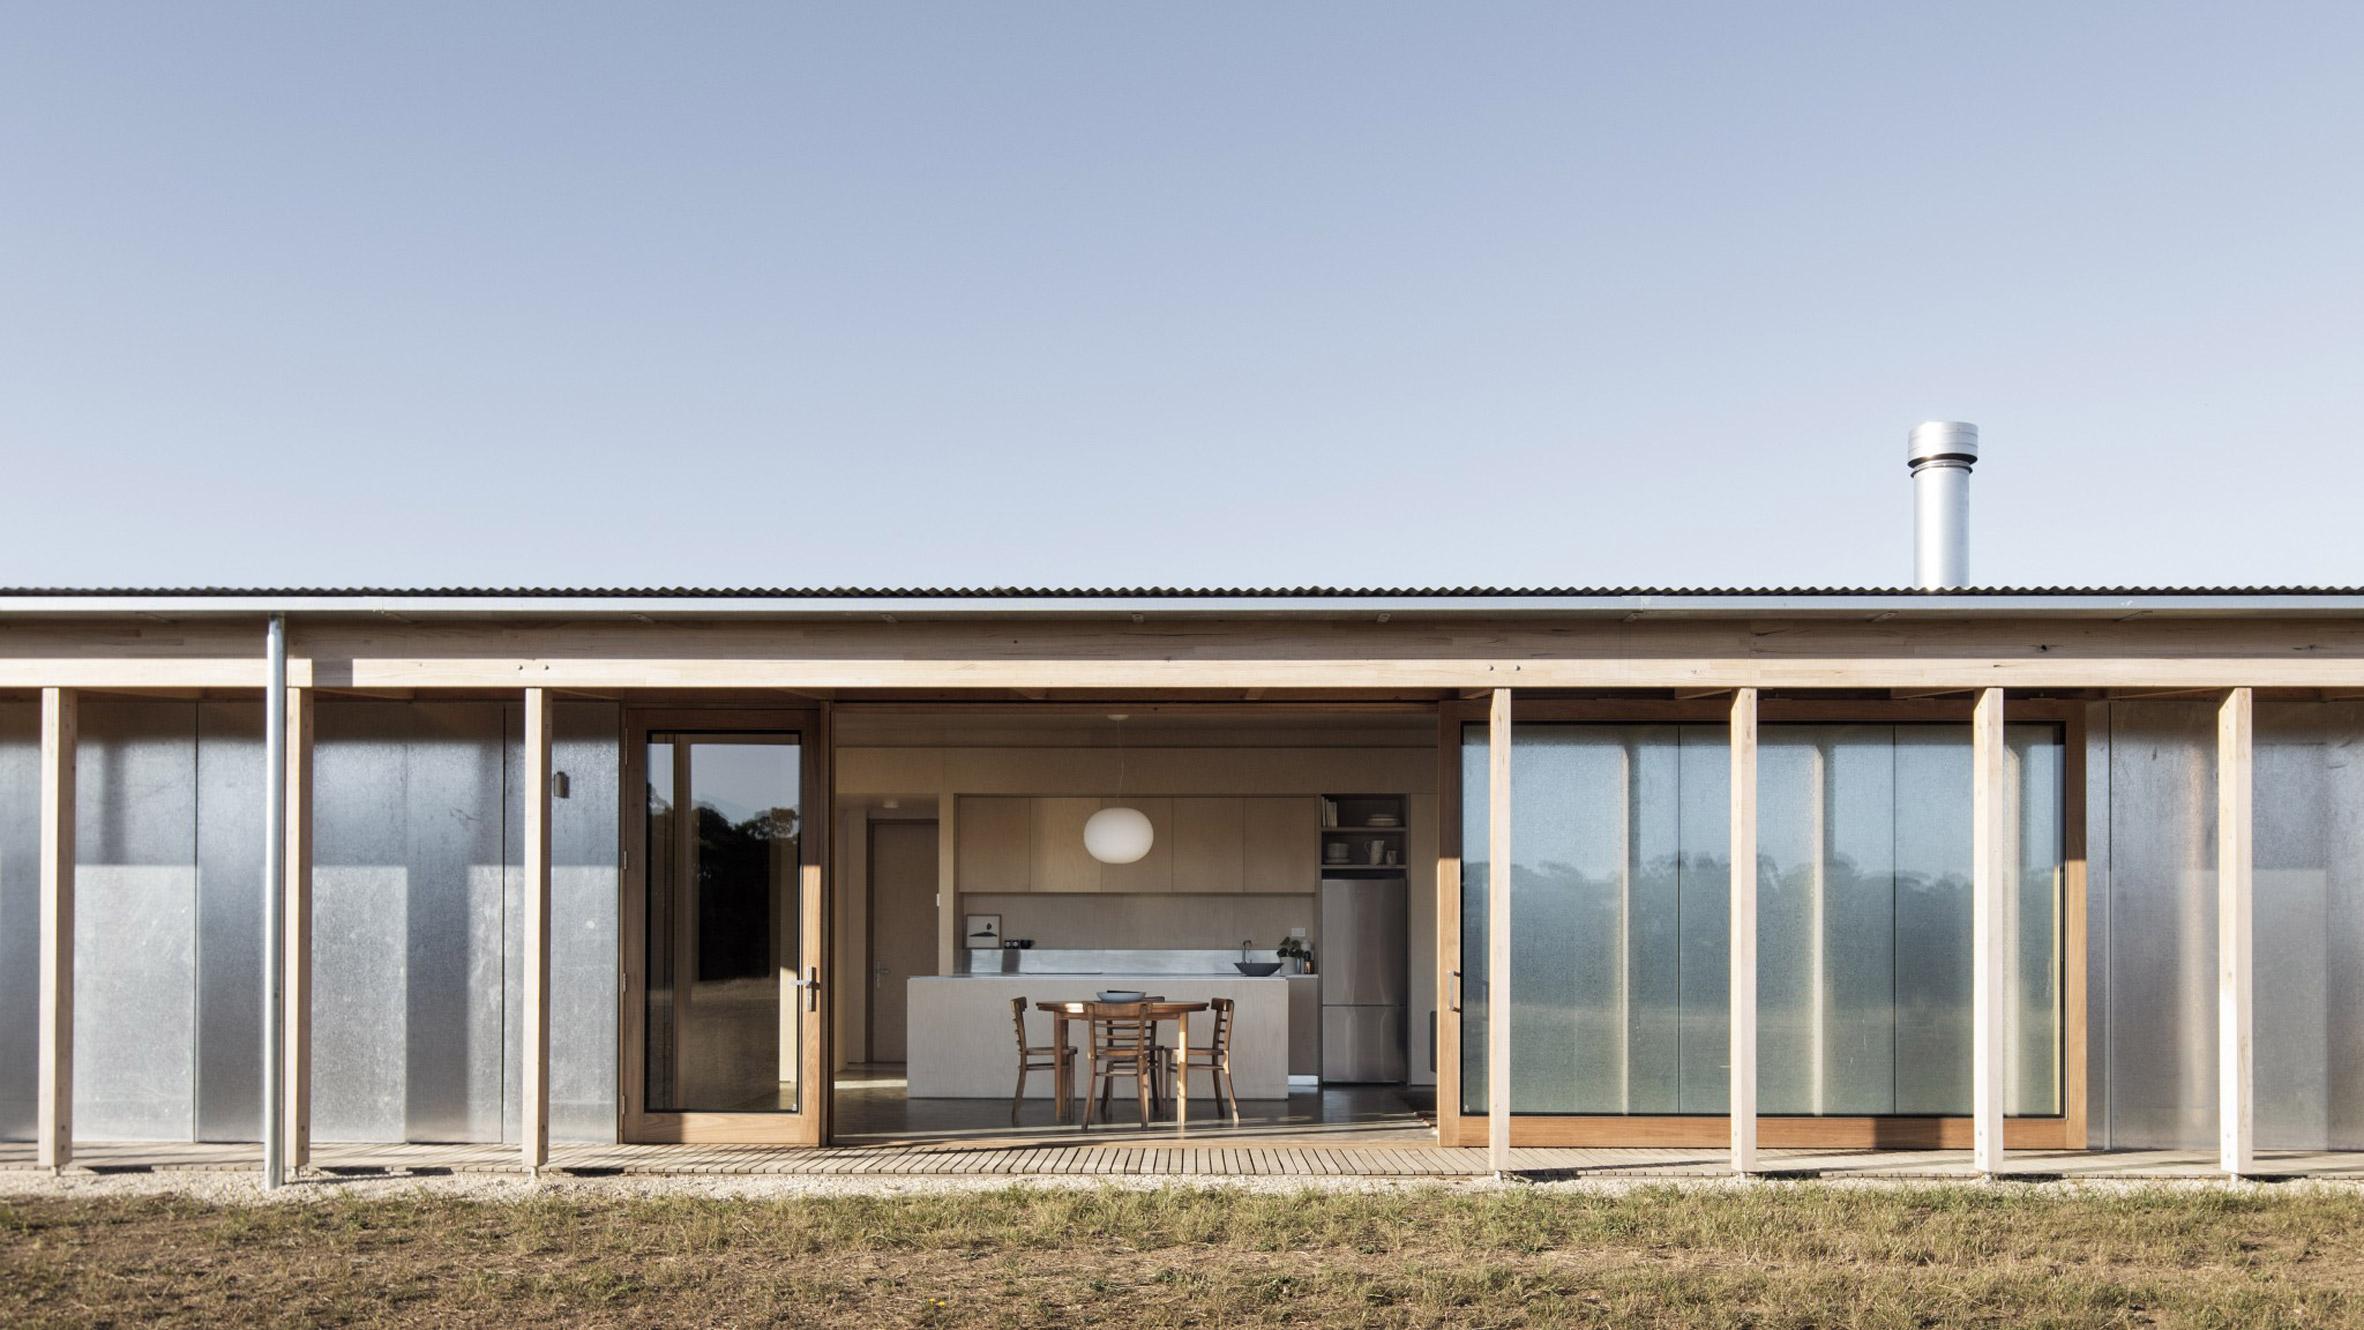 Springhill House, Springhill, Australia, byLovell Burton Architecture